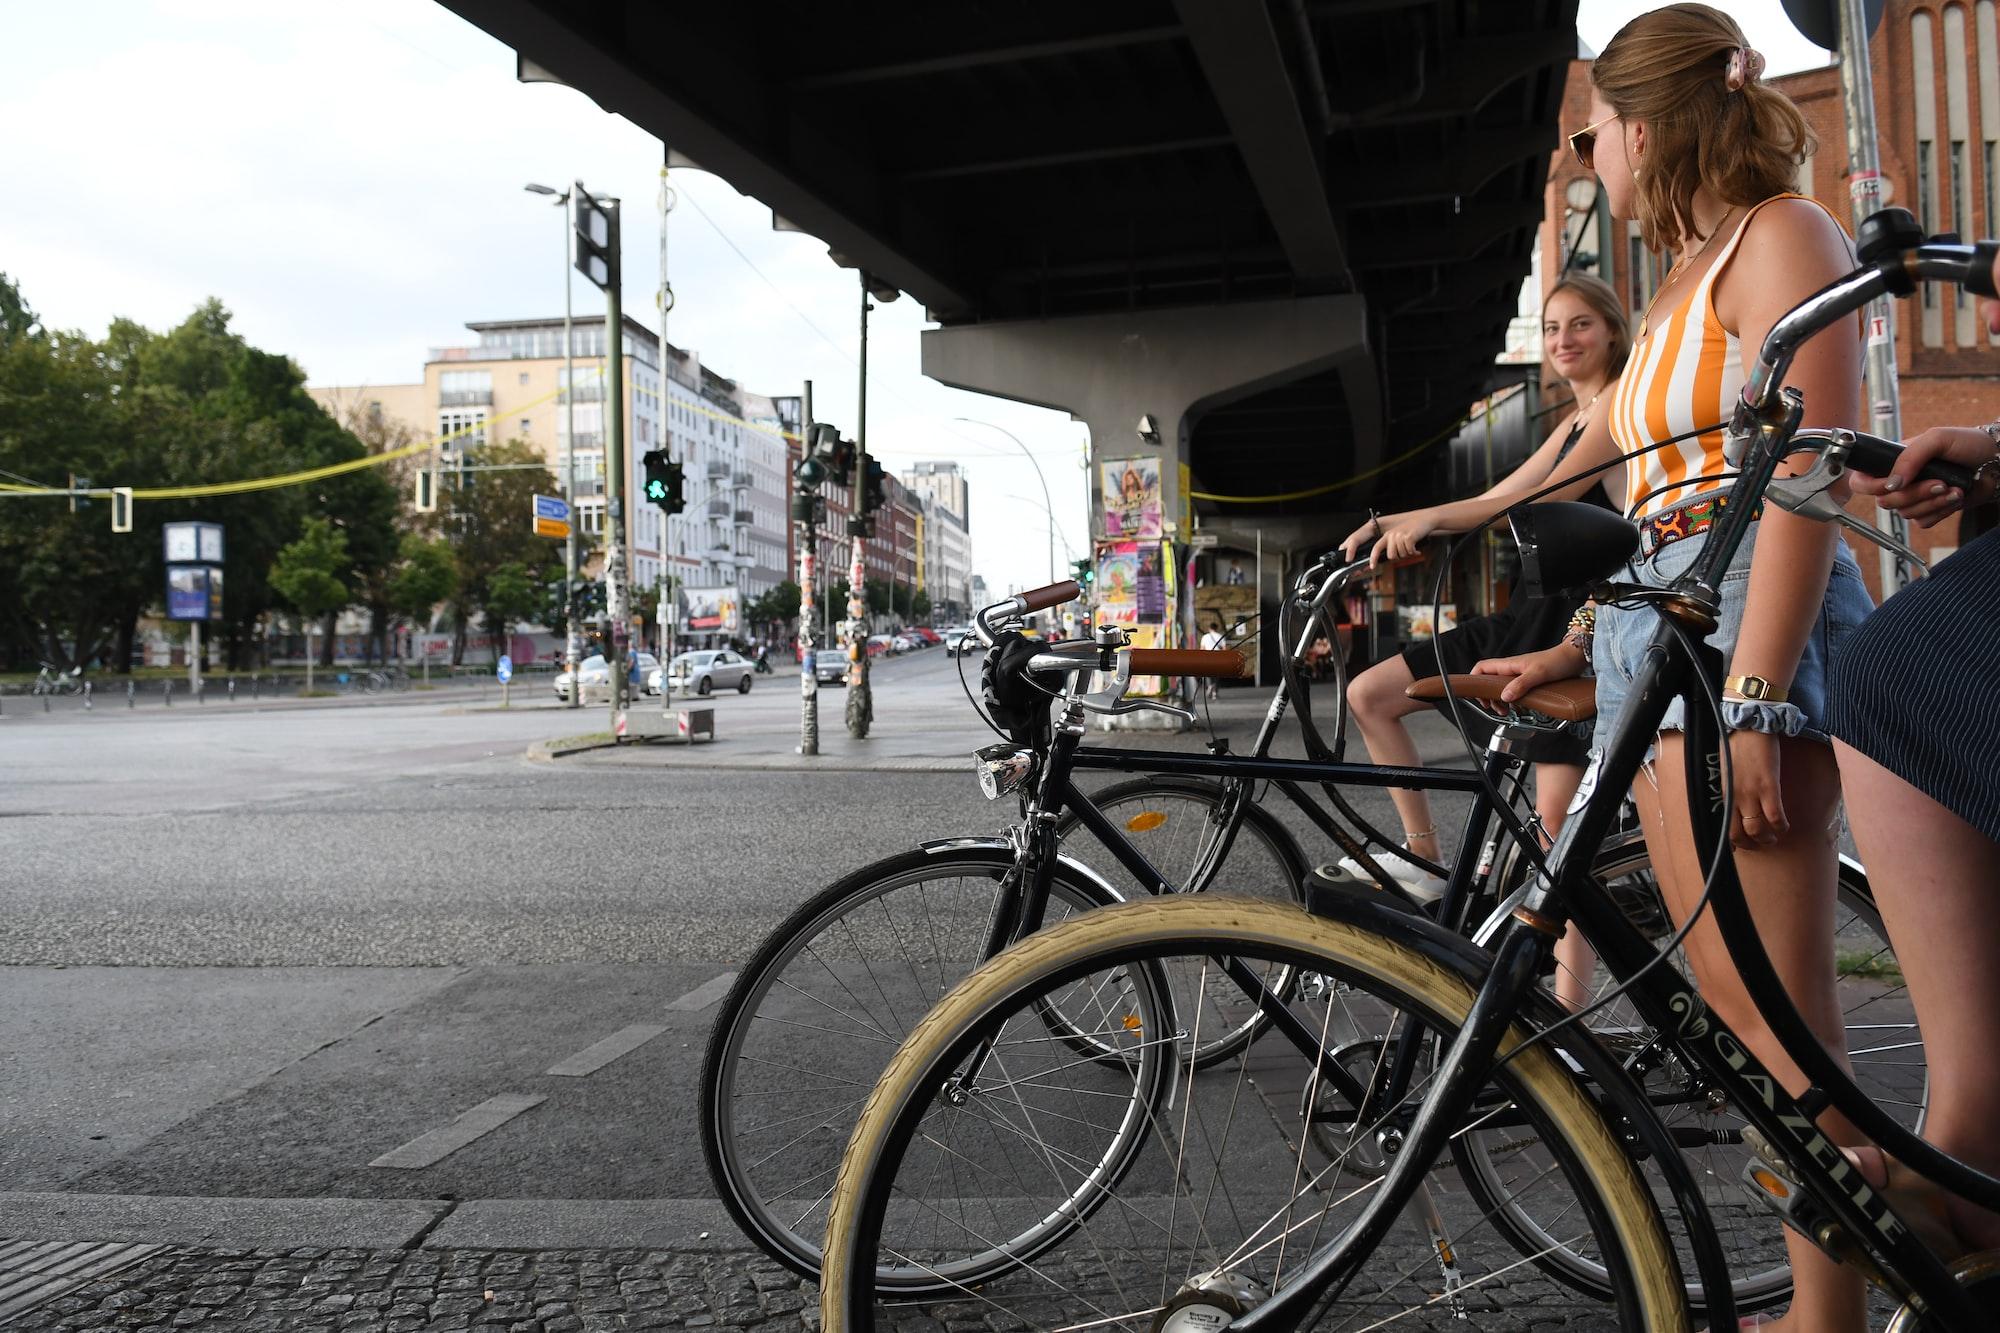 Cycling around Kreutzberg (Berlin)